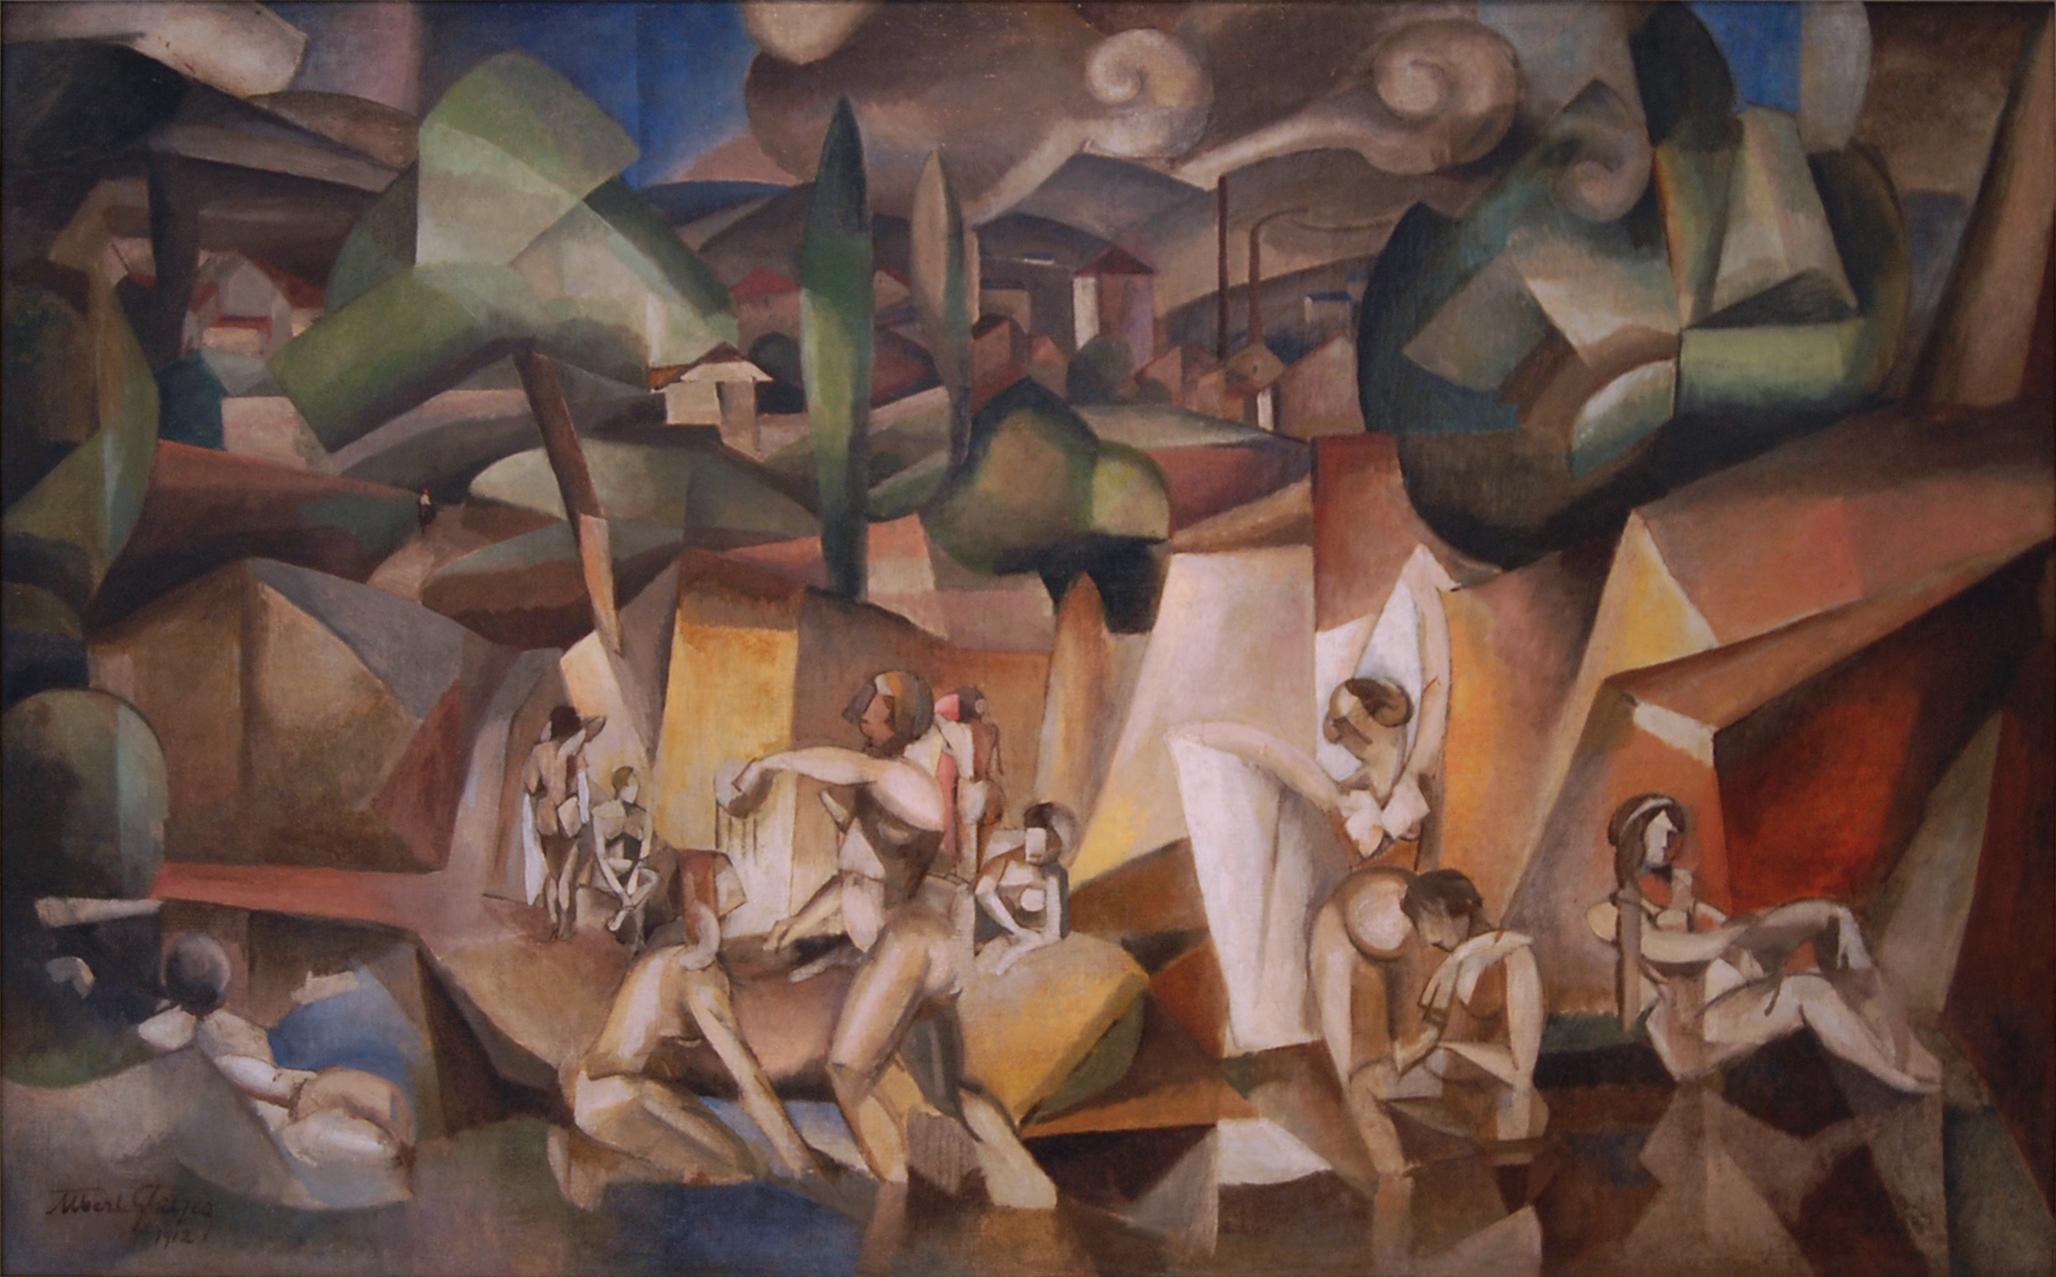 Société normande de peinture moderne   wikipedia